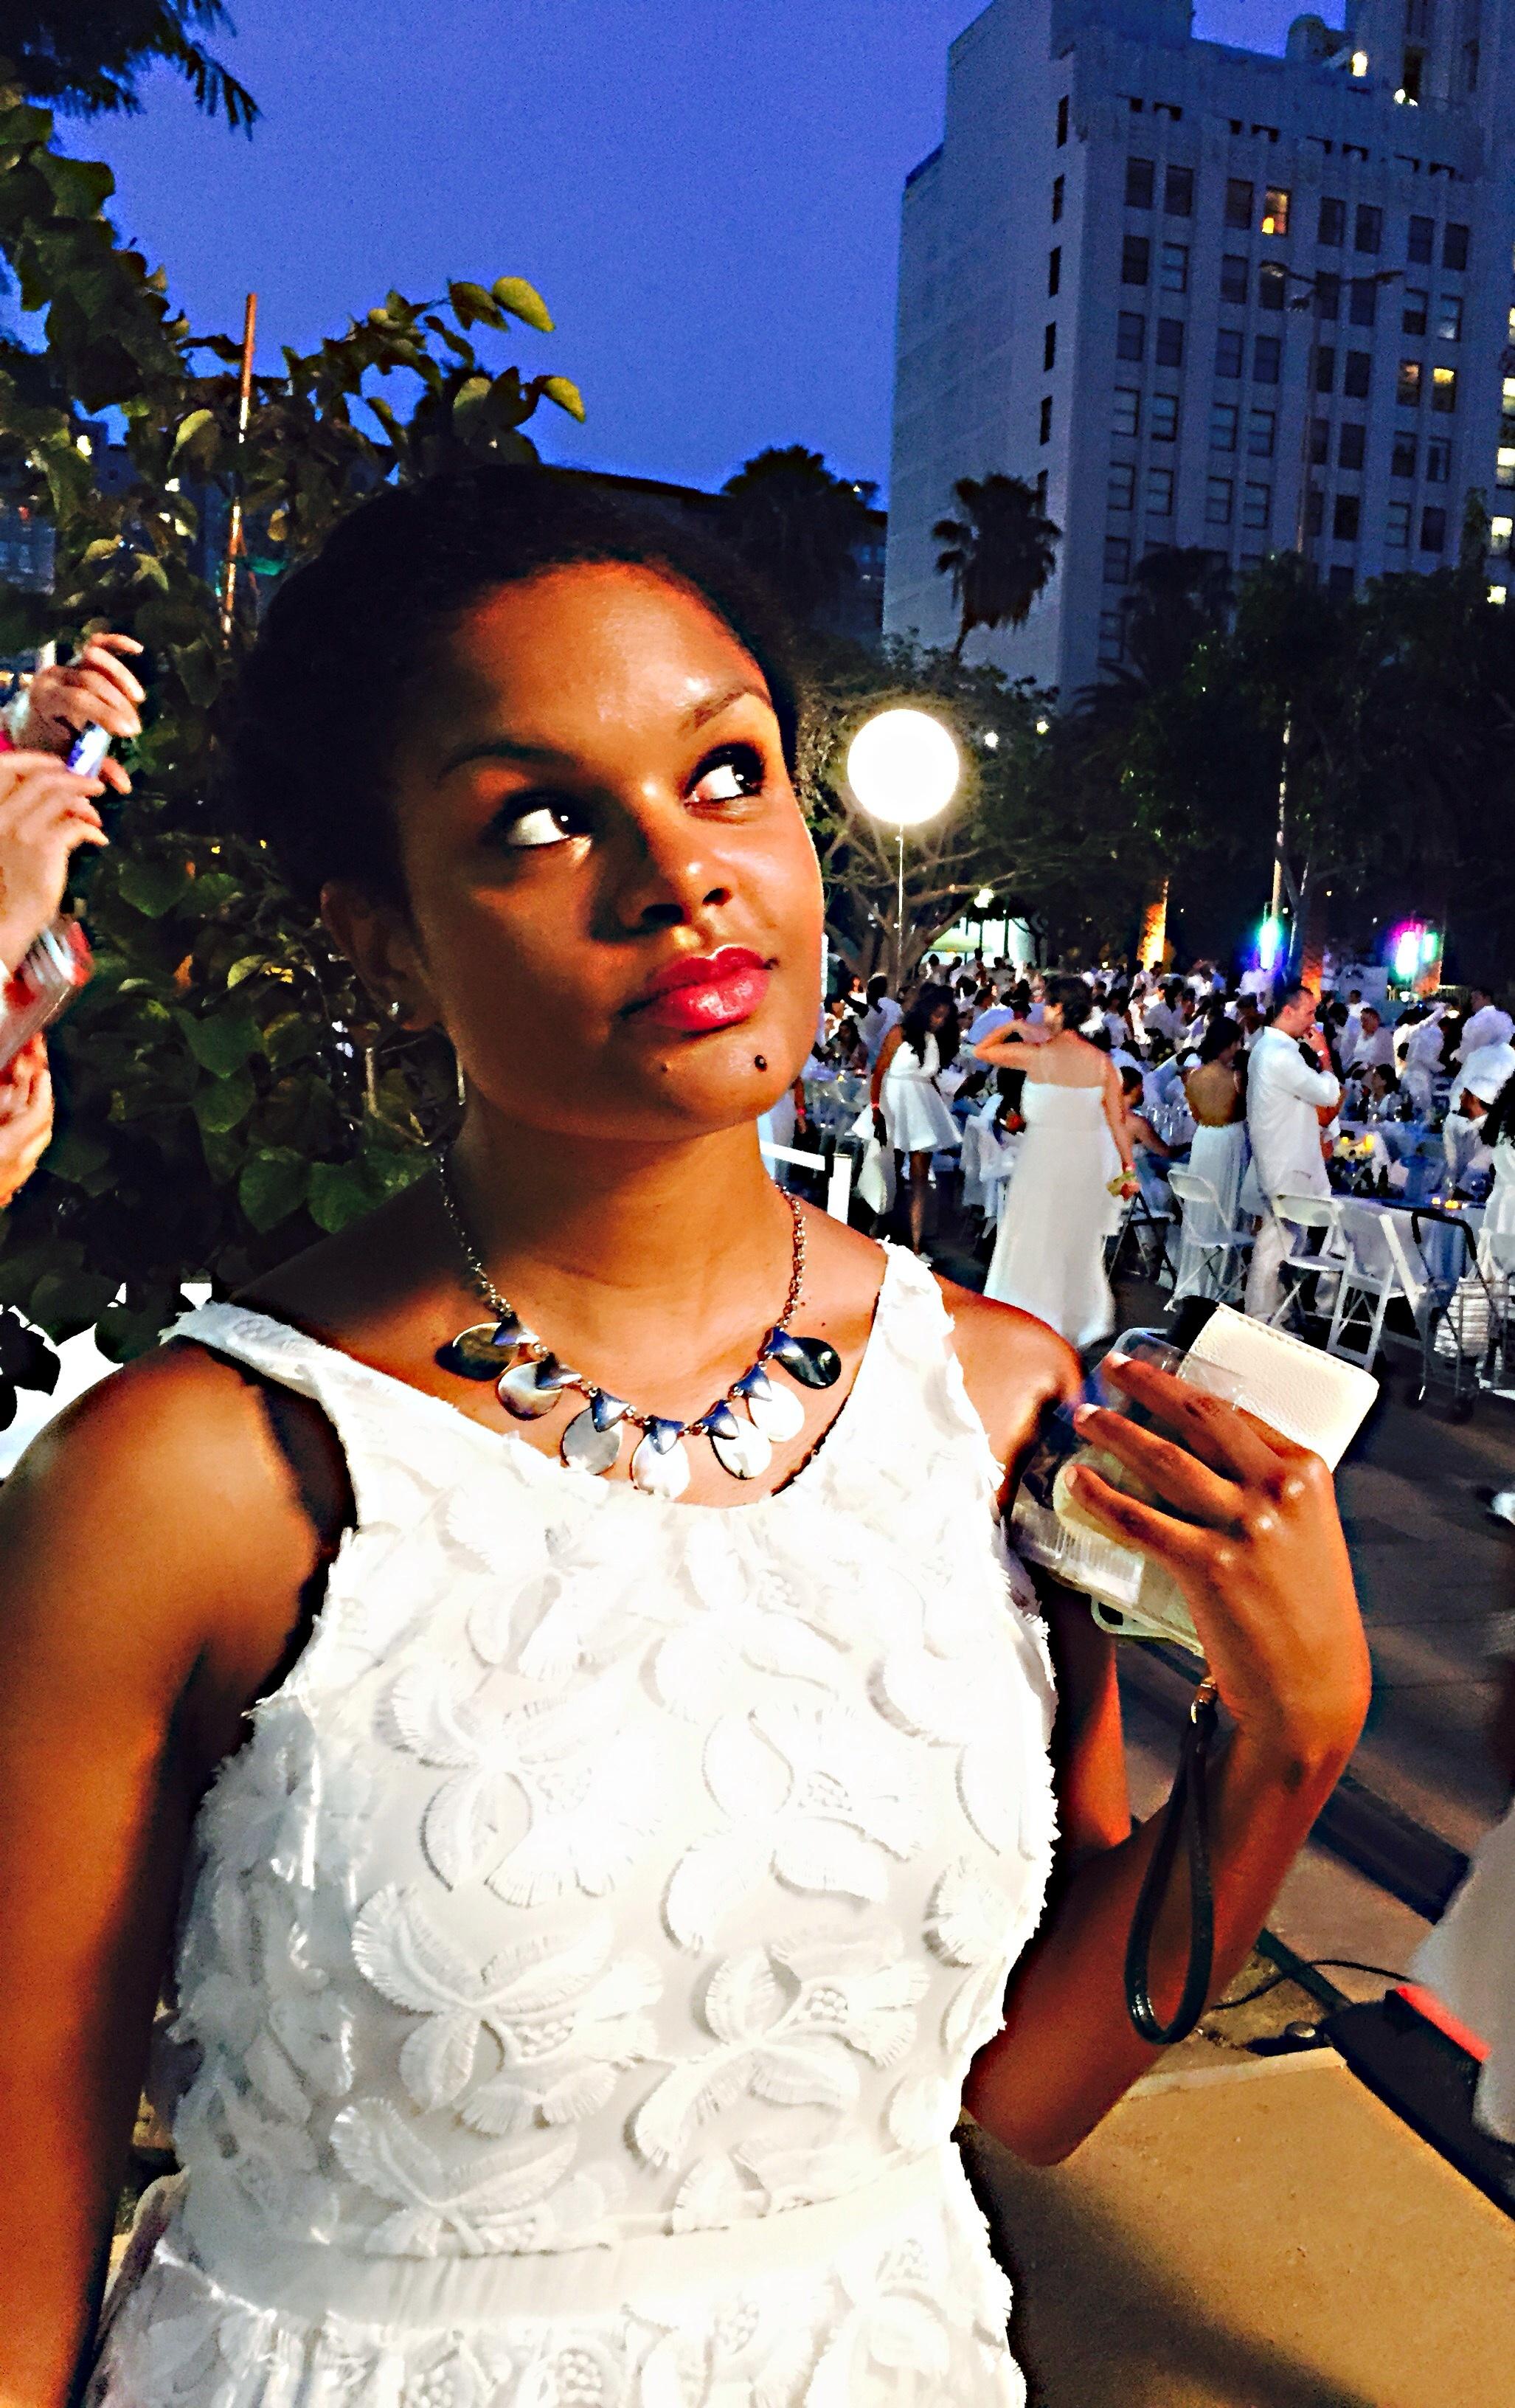 BarrisTourista-Diner en Blanc Los Angeles 2015 tyra